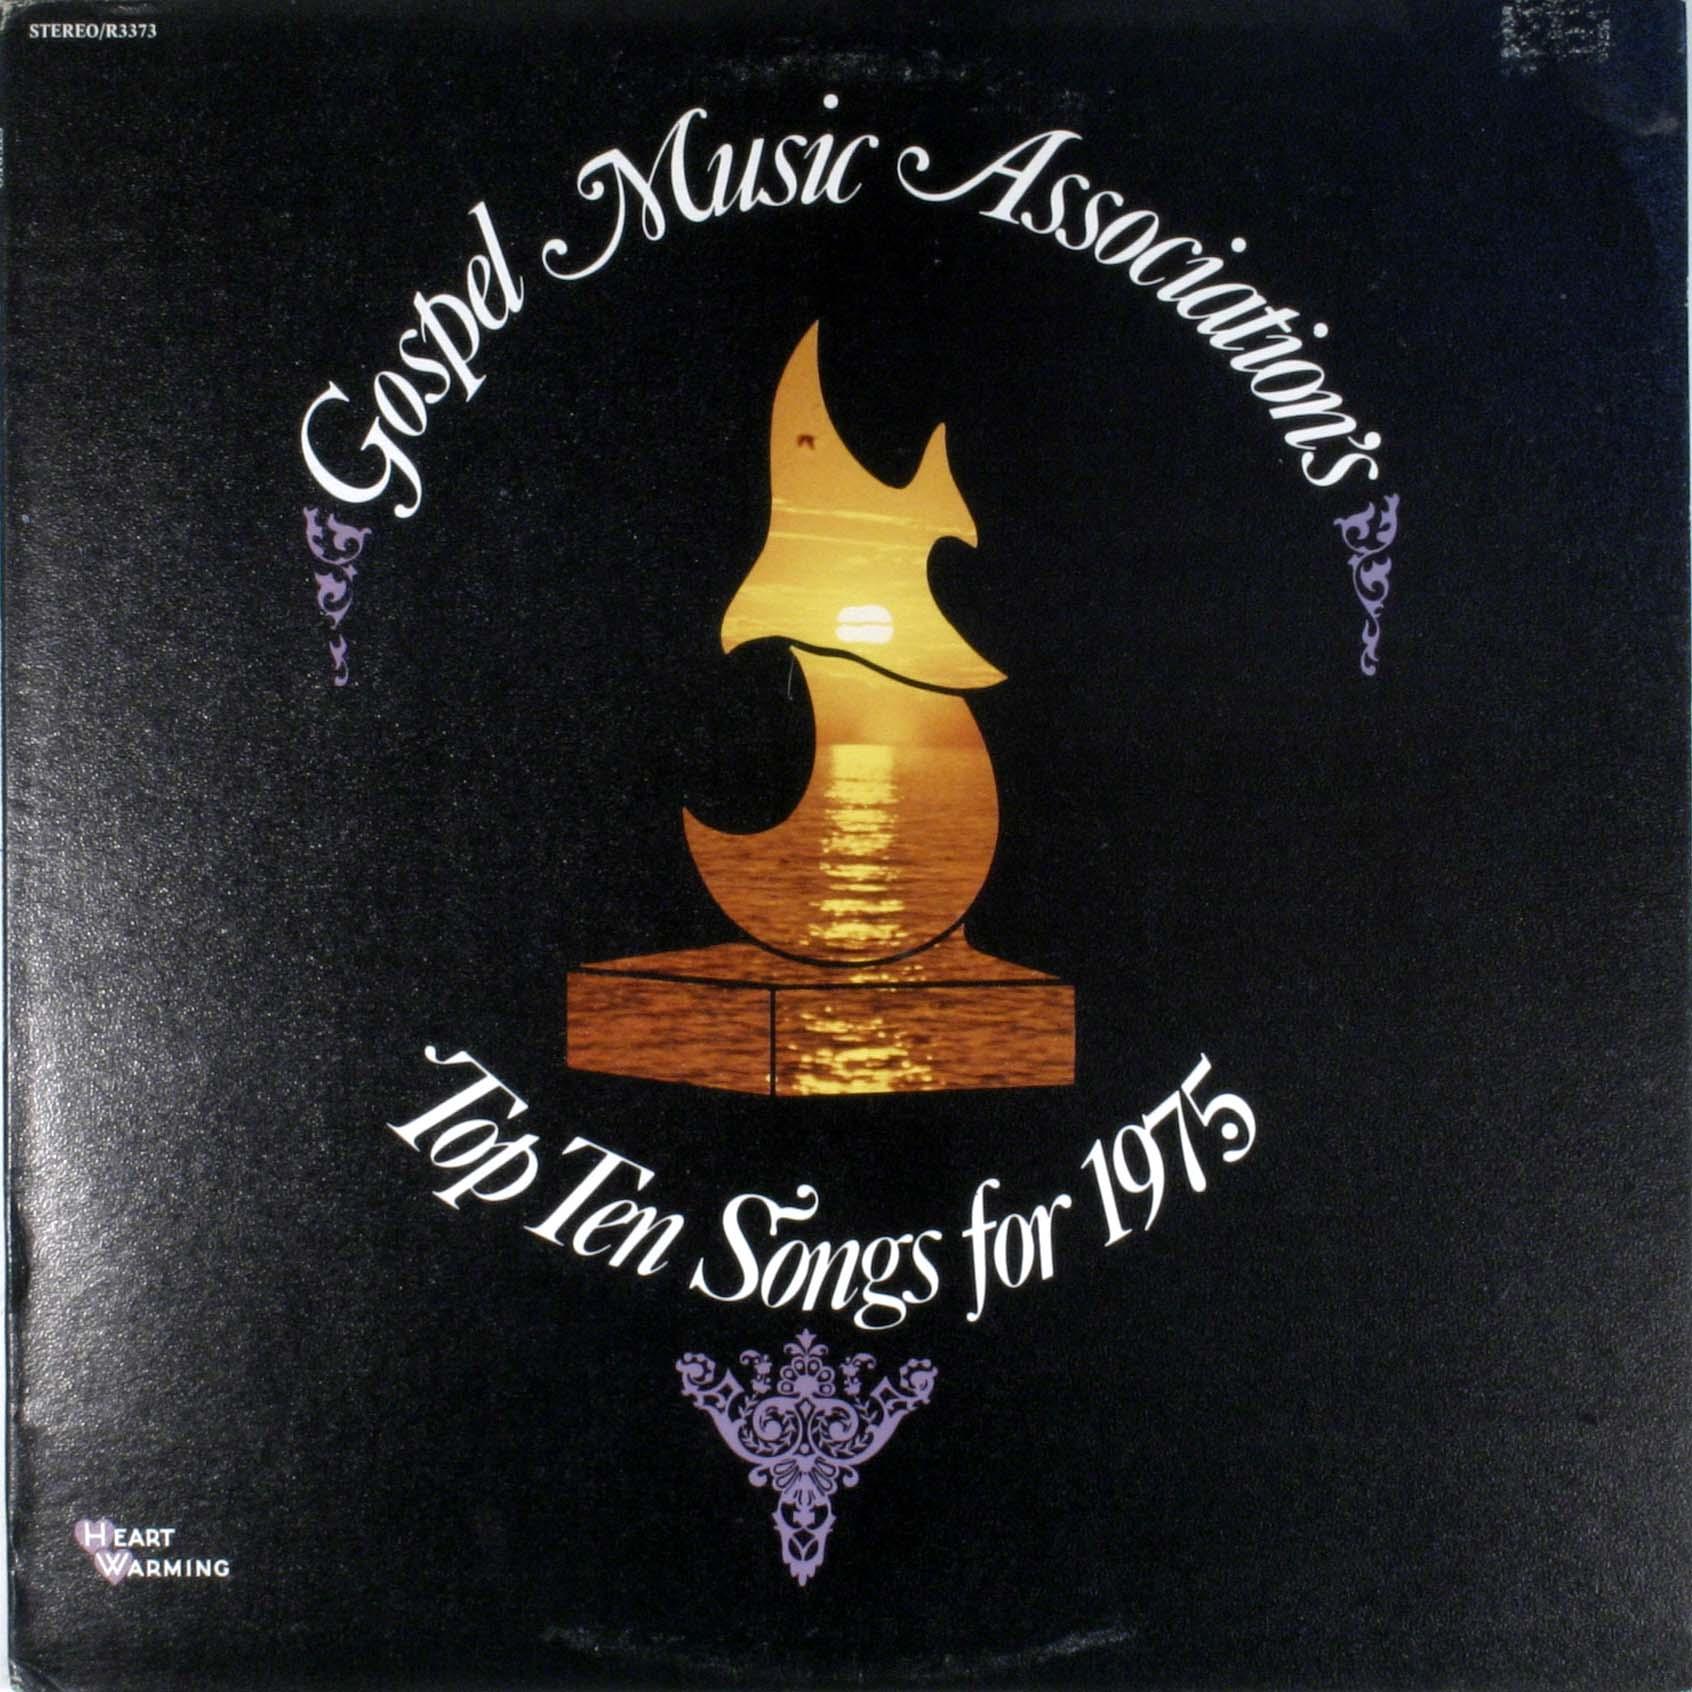 Gospel Music Association - Top Ten Songs For 1975